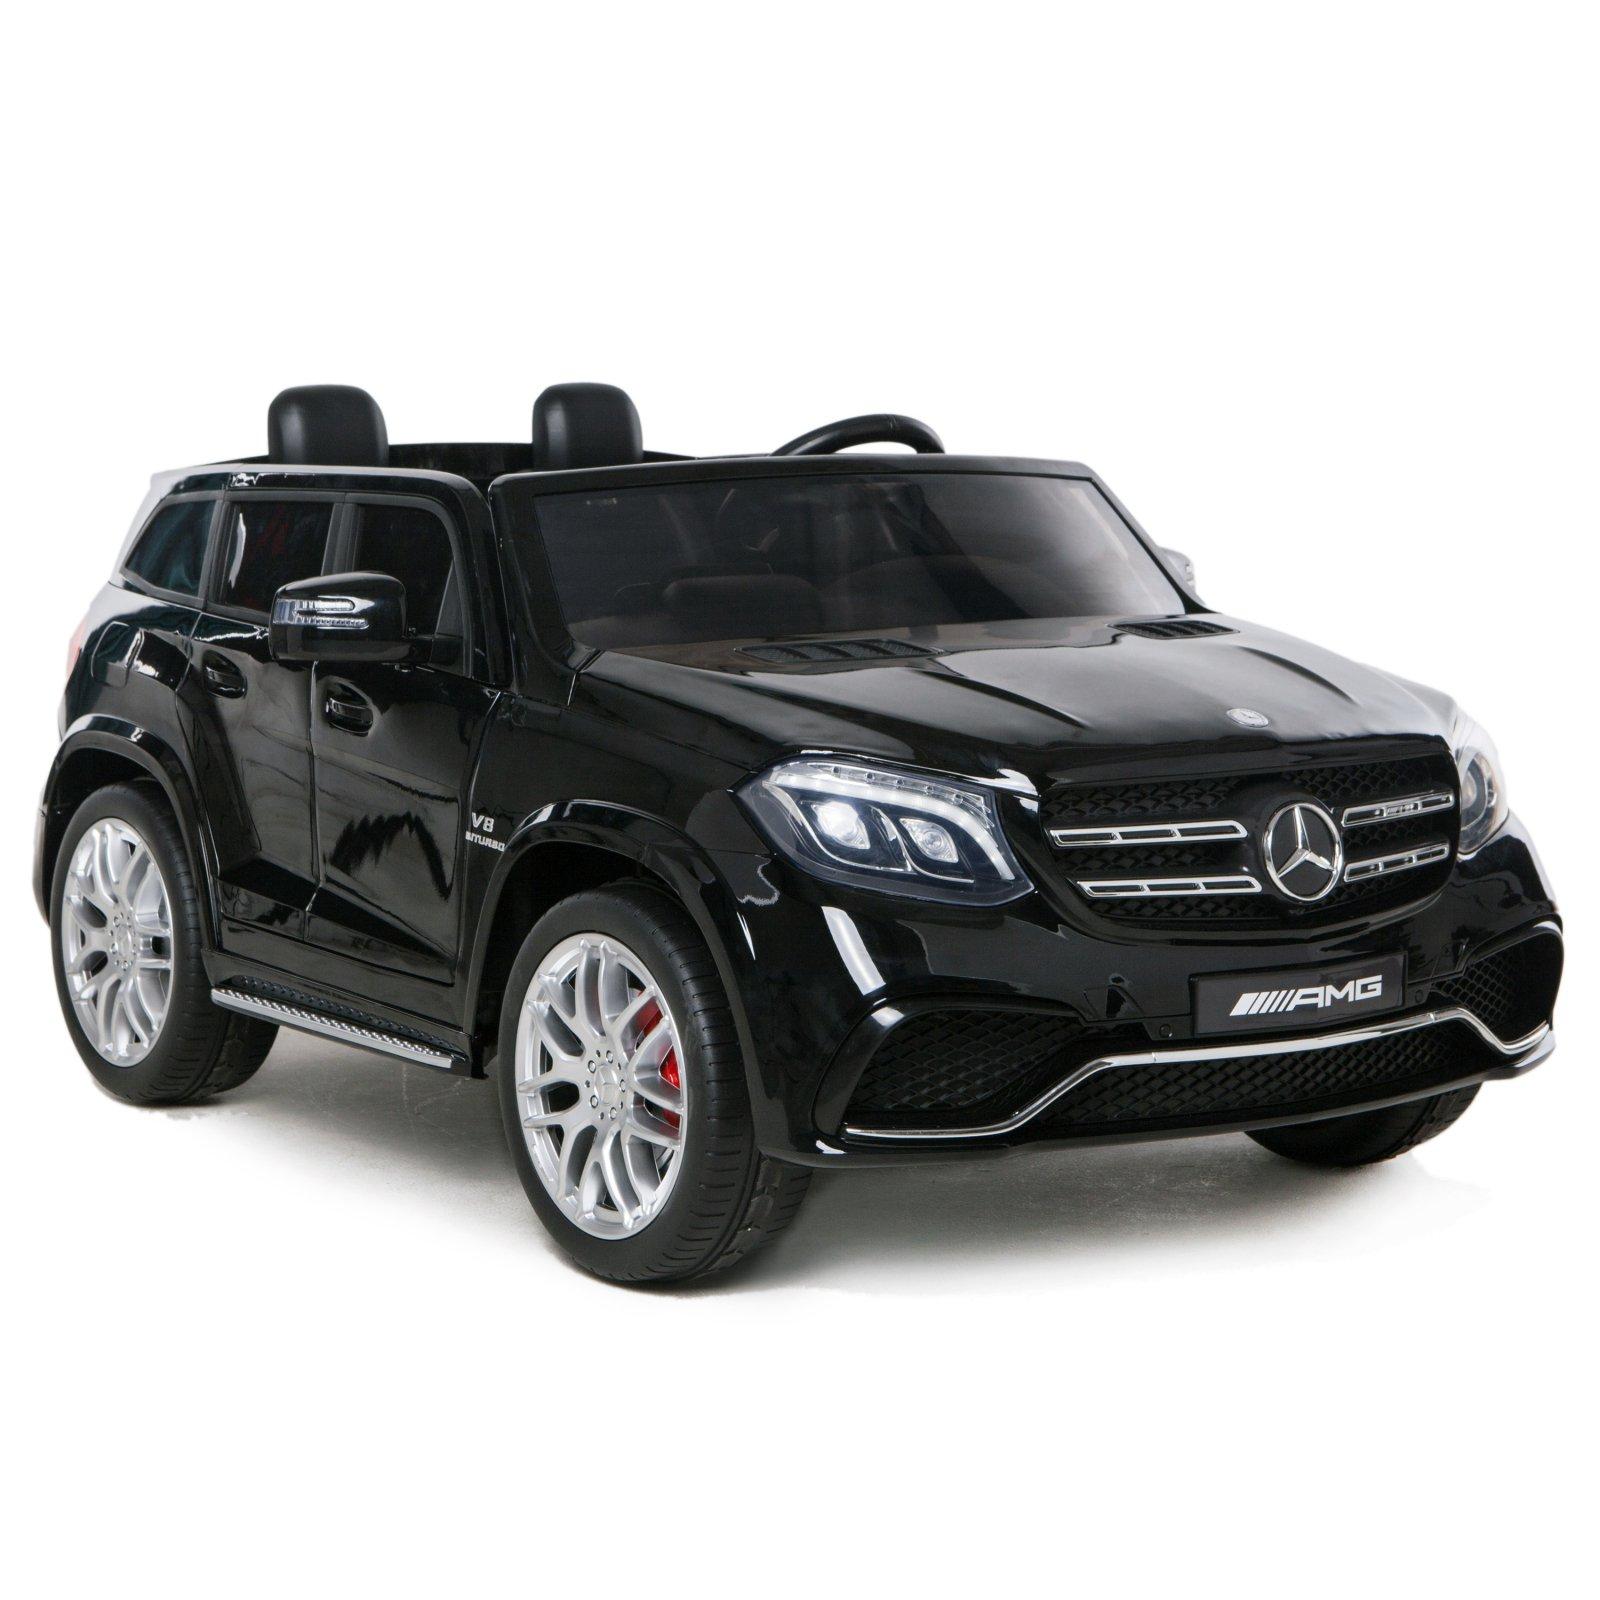 KidPlay Licensed Mercedes GLS63 Kids 2 Seater Ride On Car Working Lights - Black